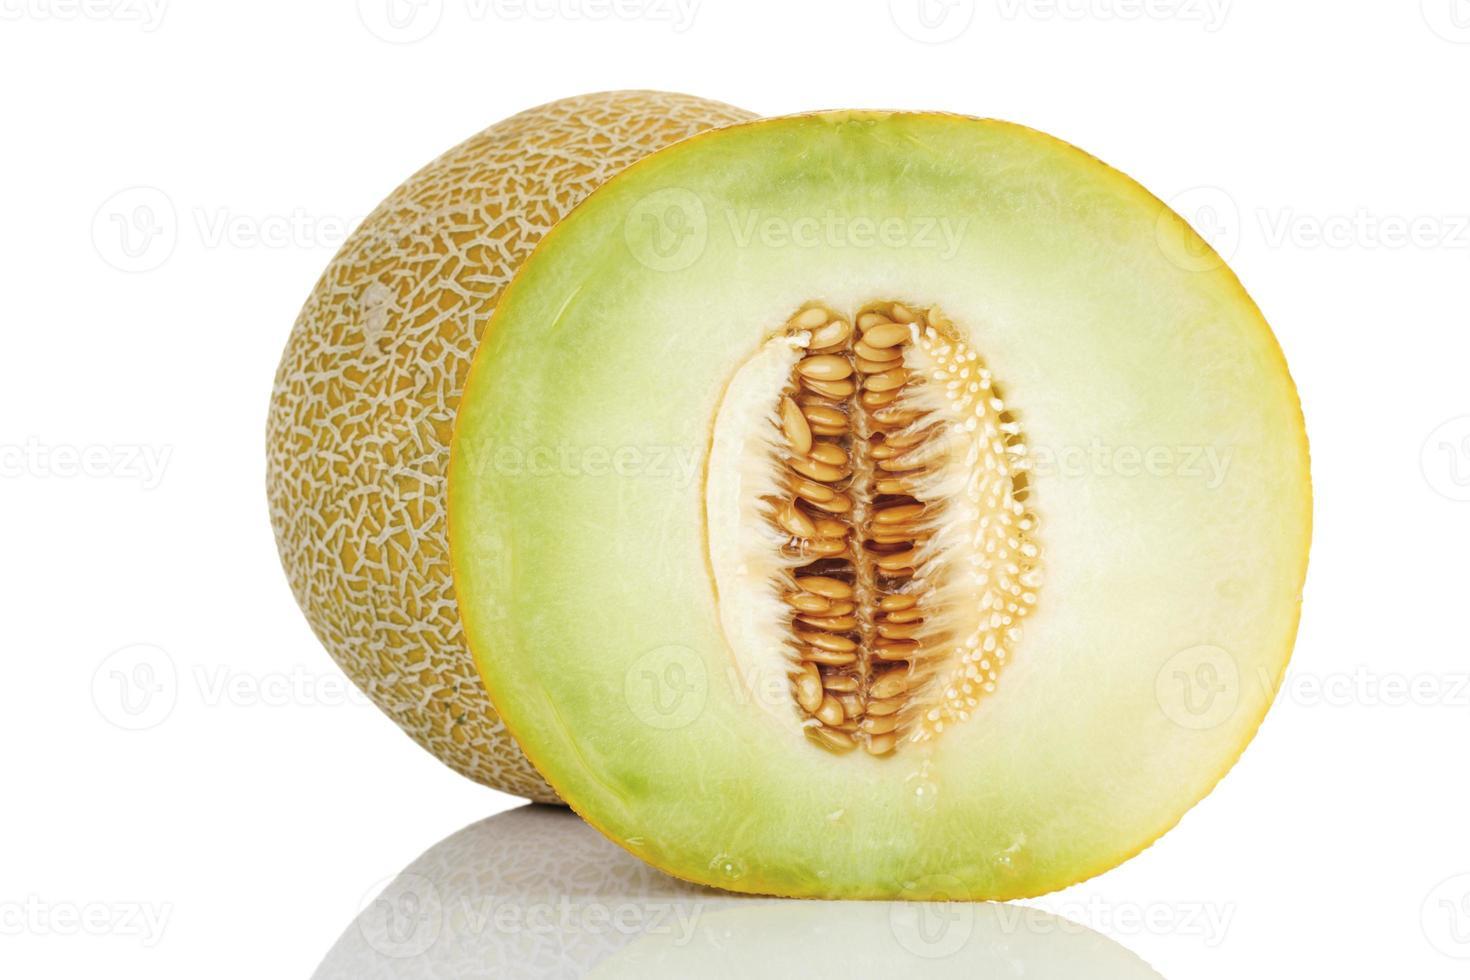 Melons, close-up photo